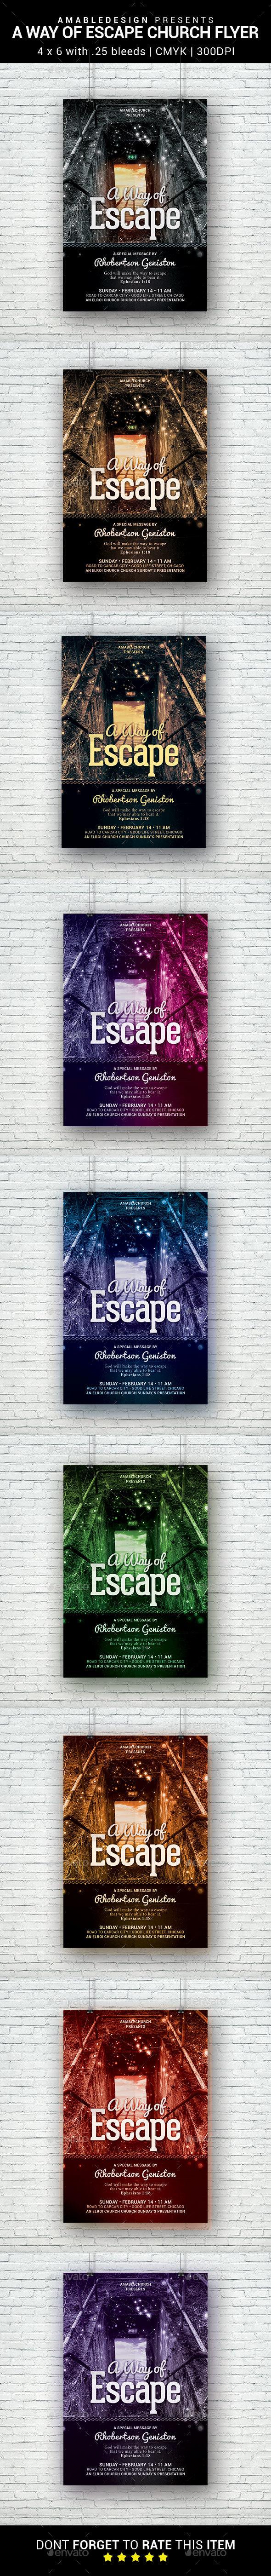 A Way of Escape Church Flyer - Church Flyers